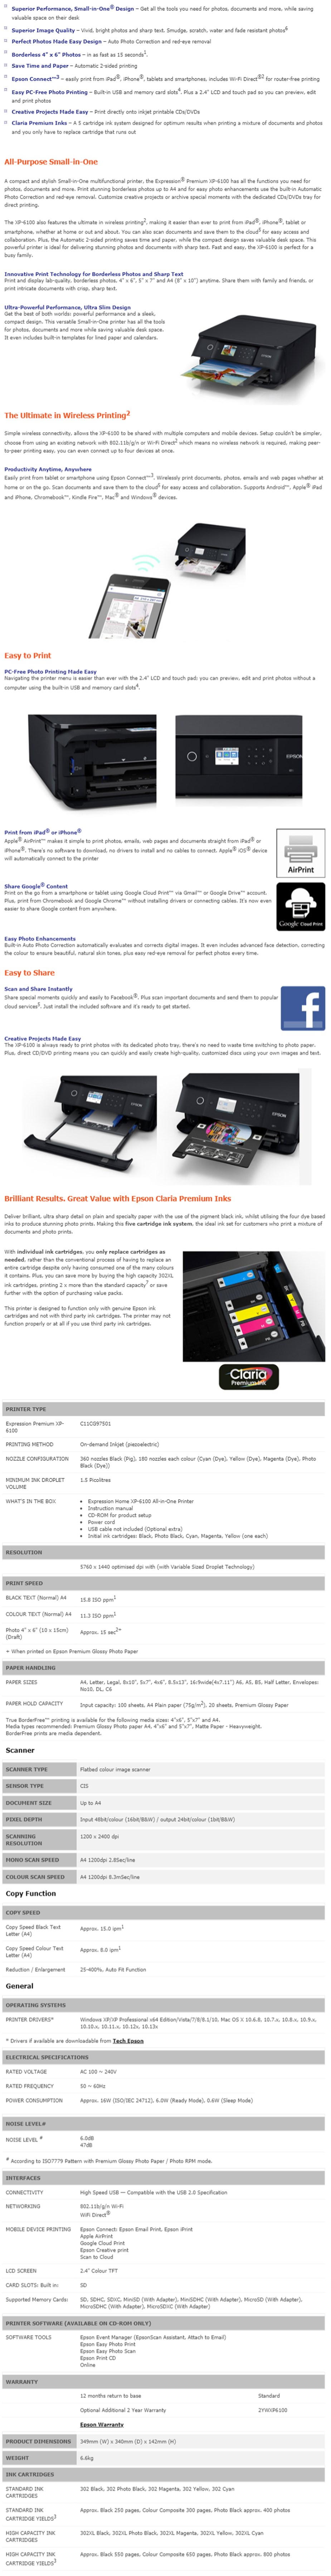 Epson Expression Premium XP-6100 Colour Multifunction Inkjet Printer - Overview 1